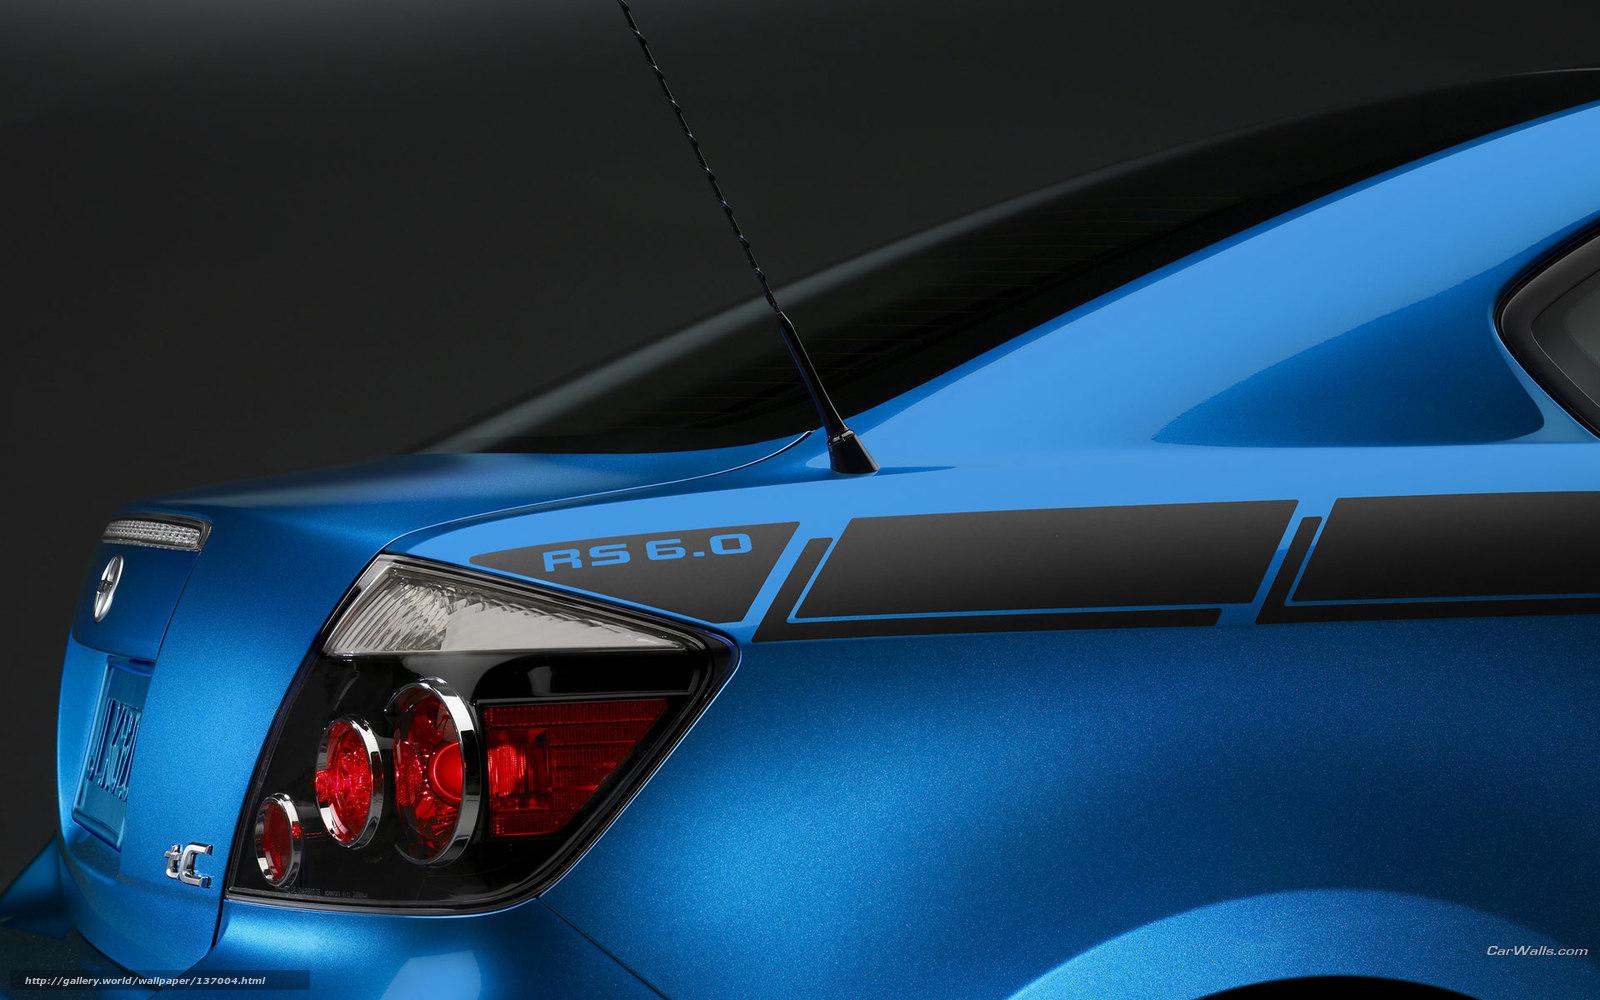 Download Wallpaper Scion Tc Car Machinery Free Desktop